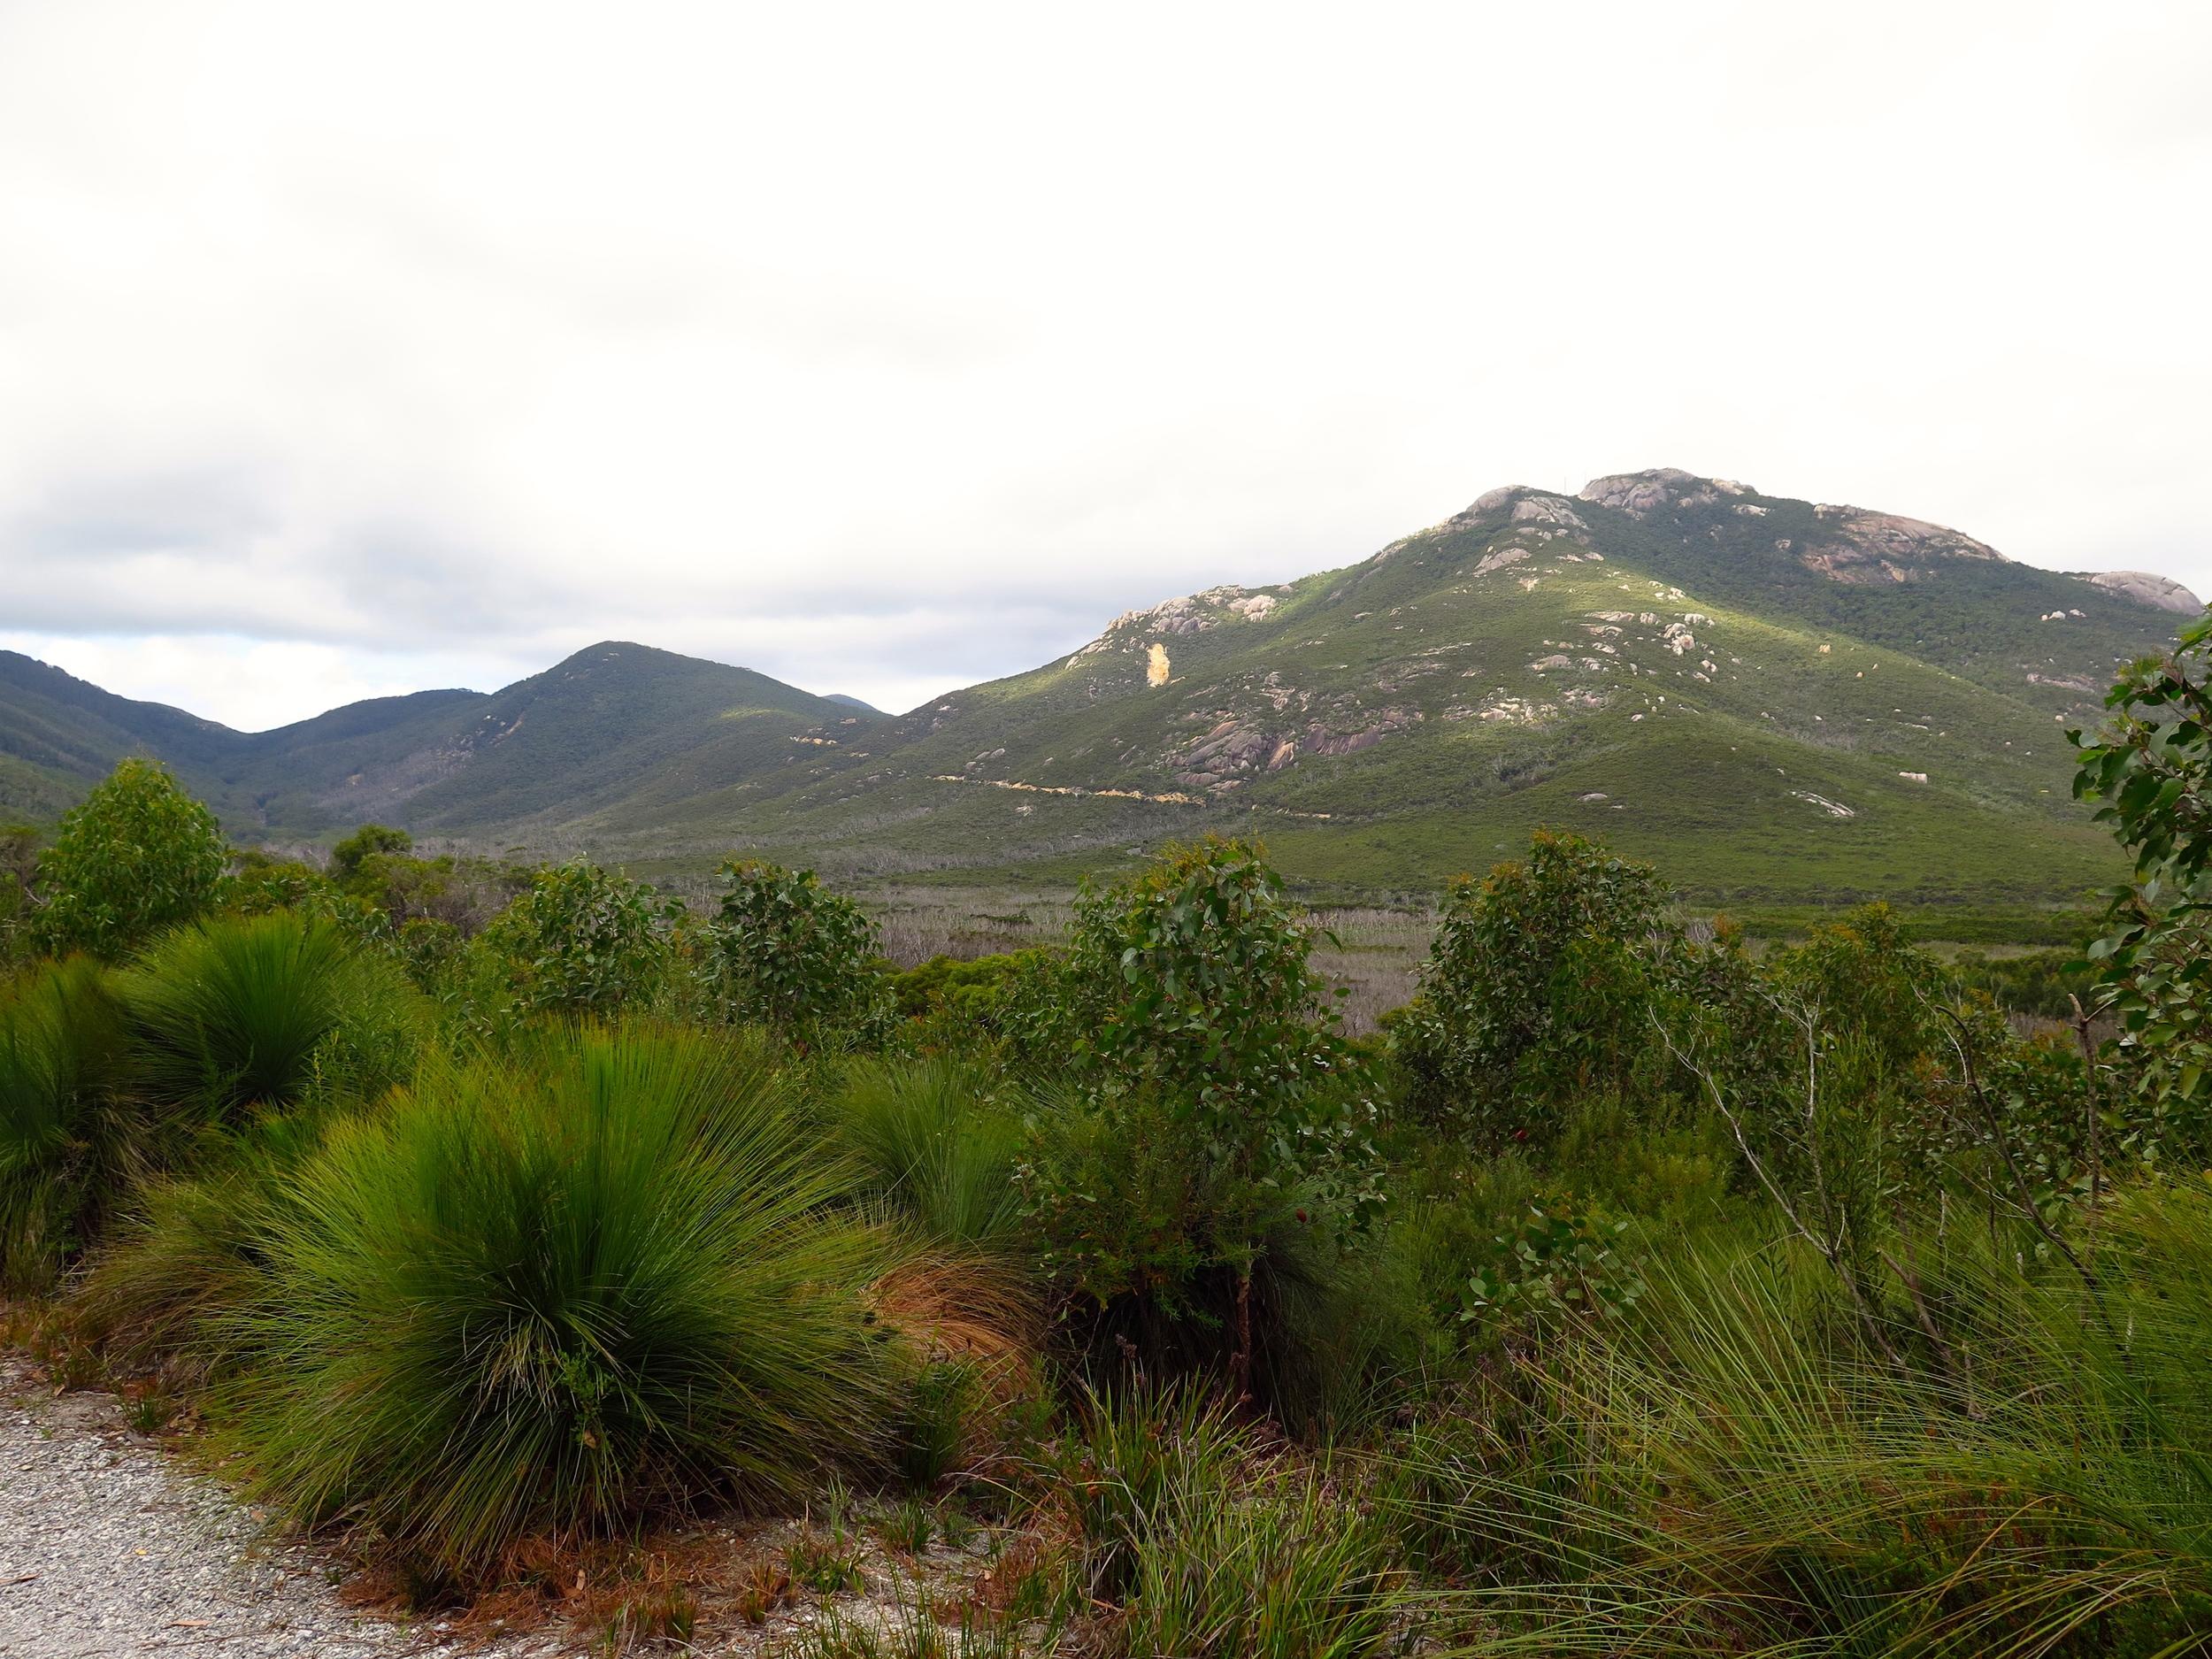 The spectacular Mount Oberon. Photo: Cathy Cavallo